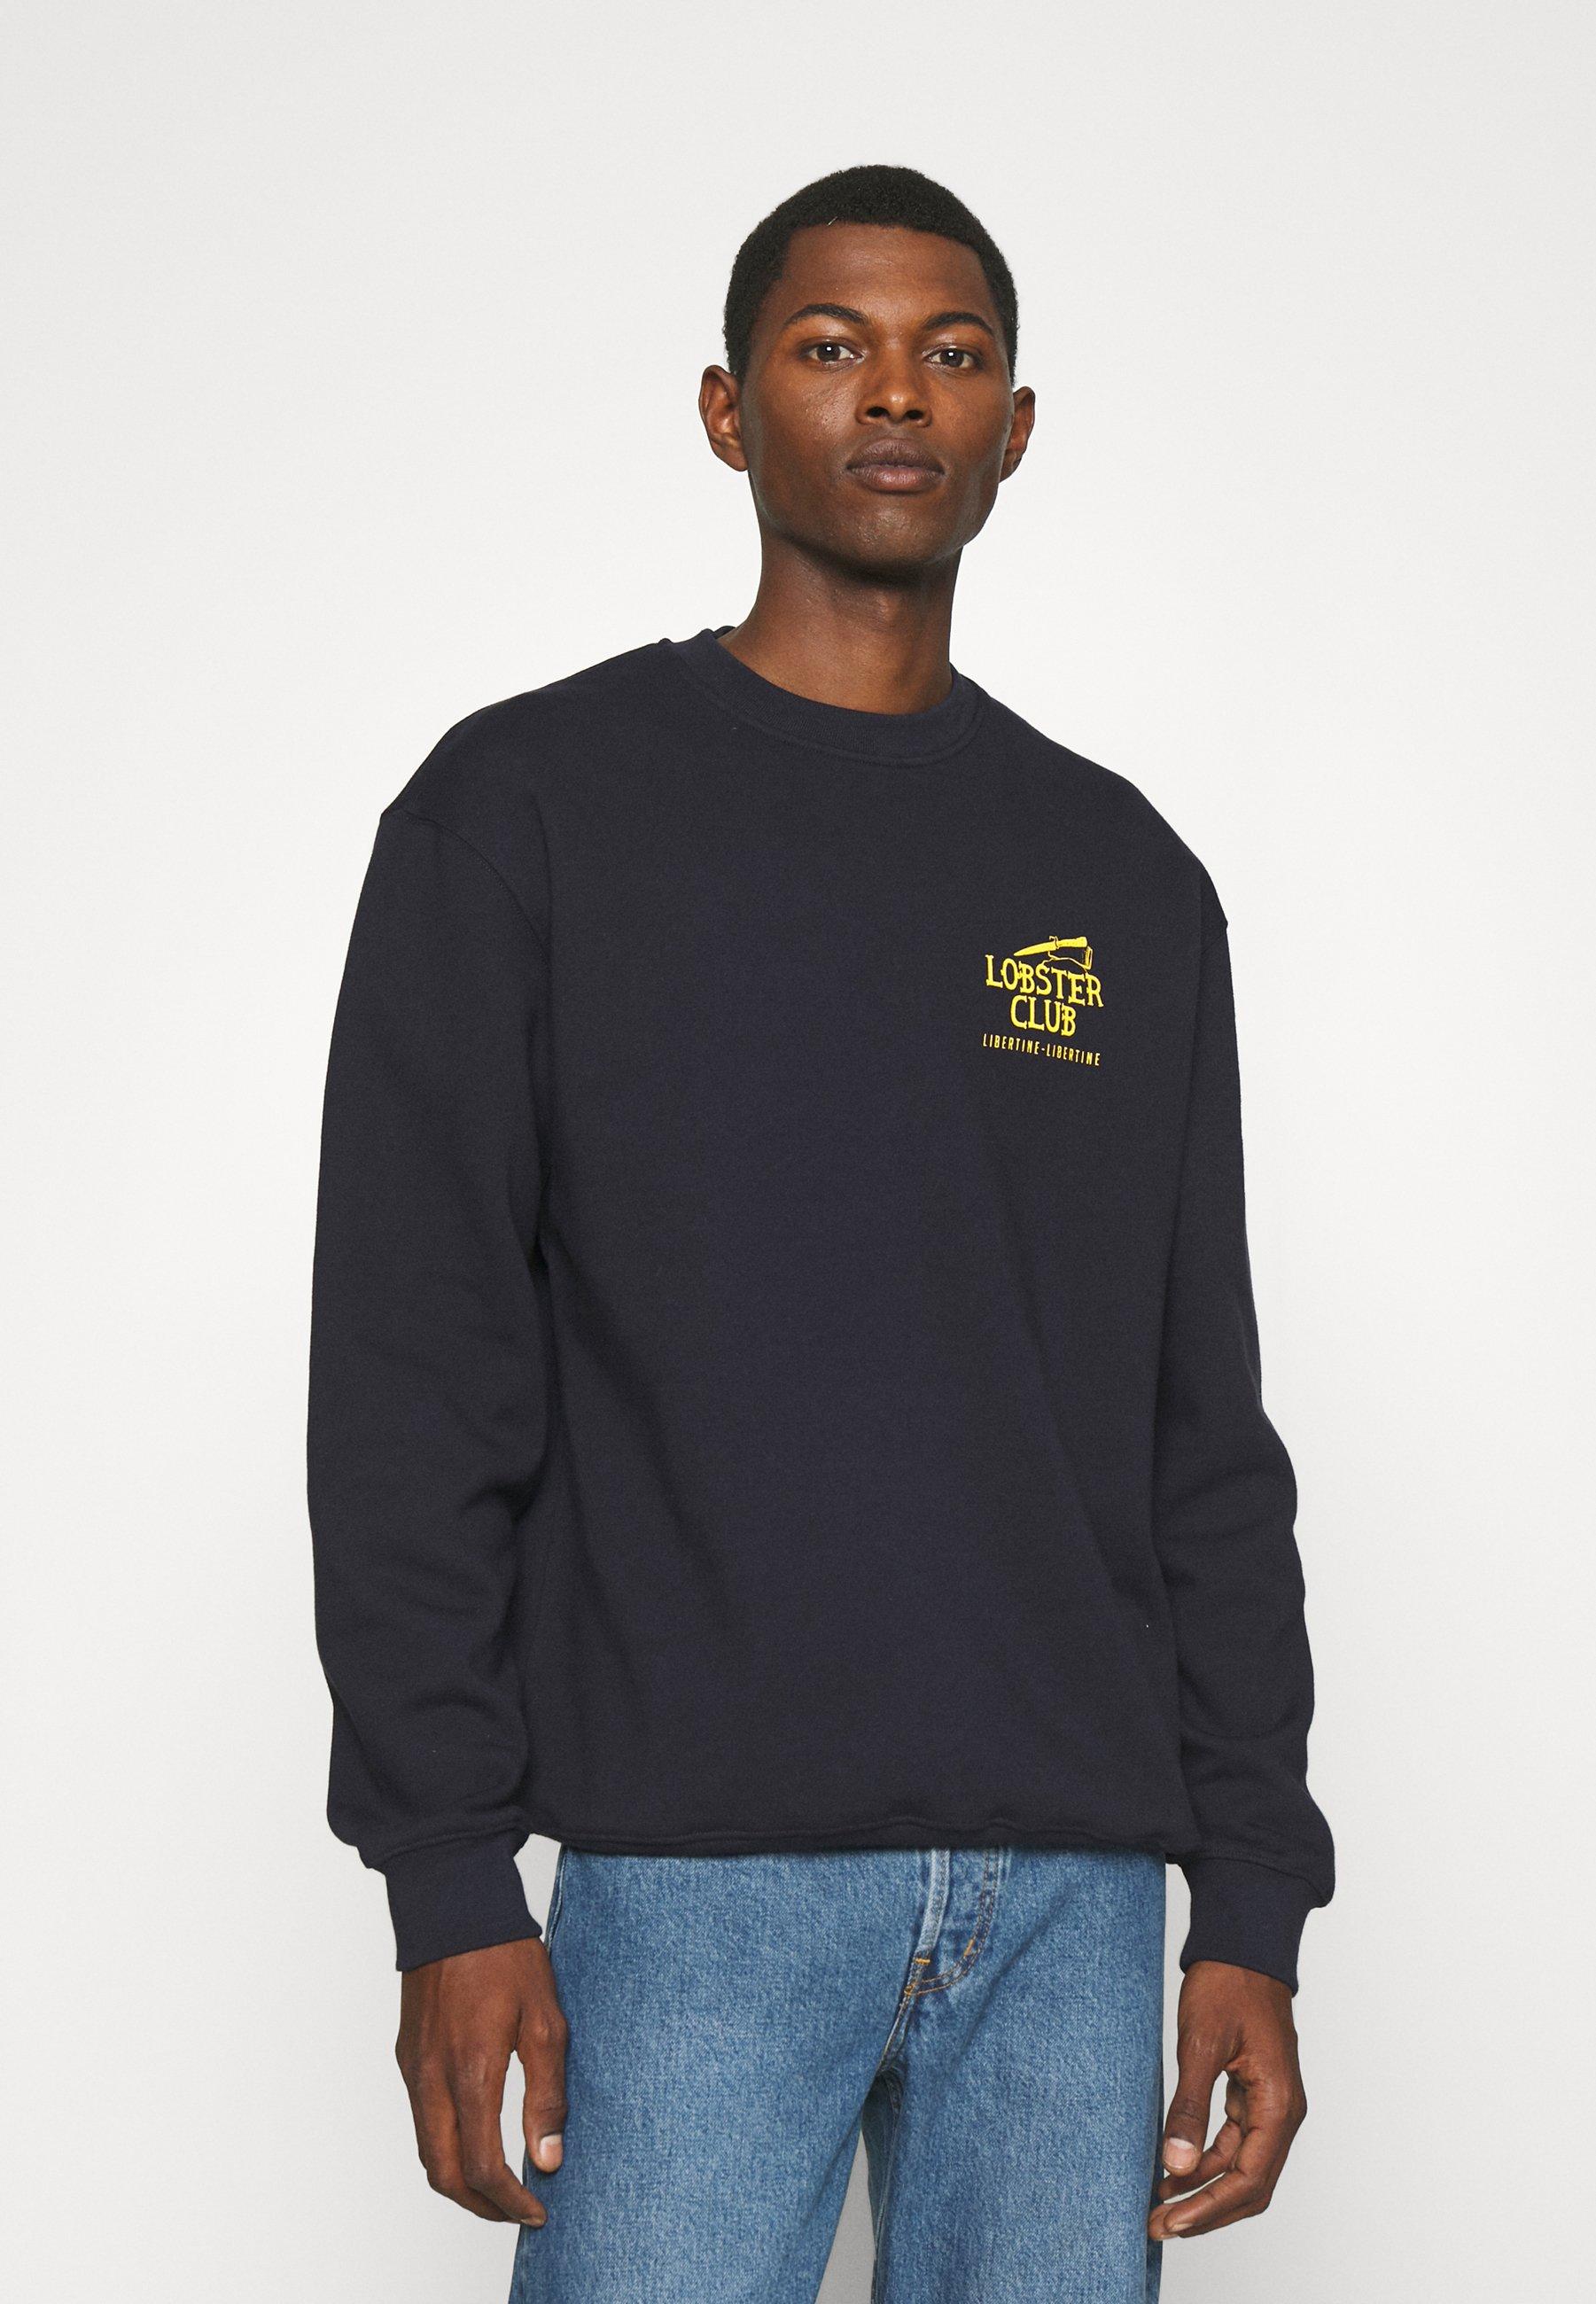 Men SOCIETY LOBSTER CLUB - Sweatshirt